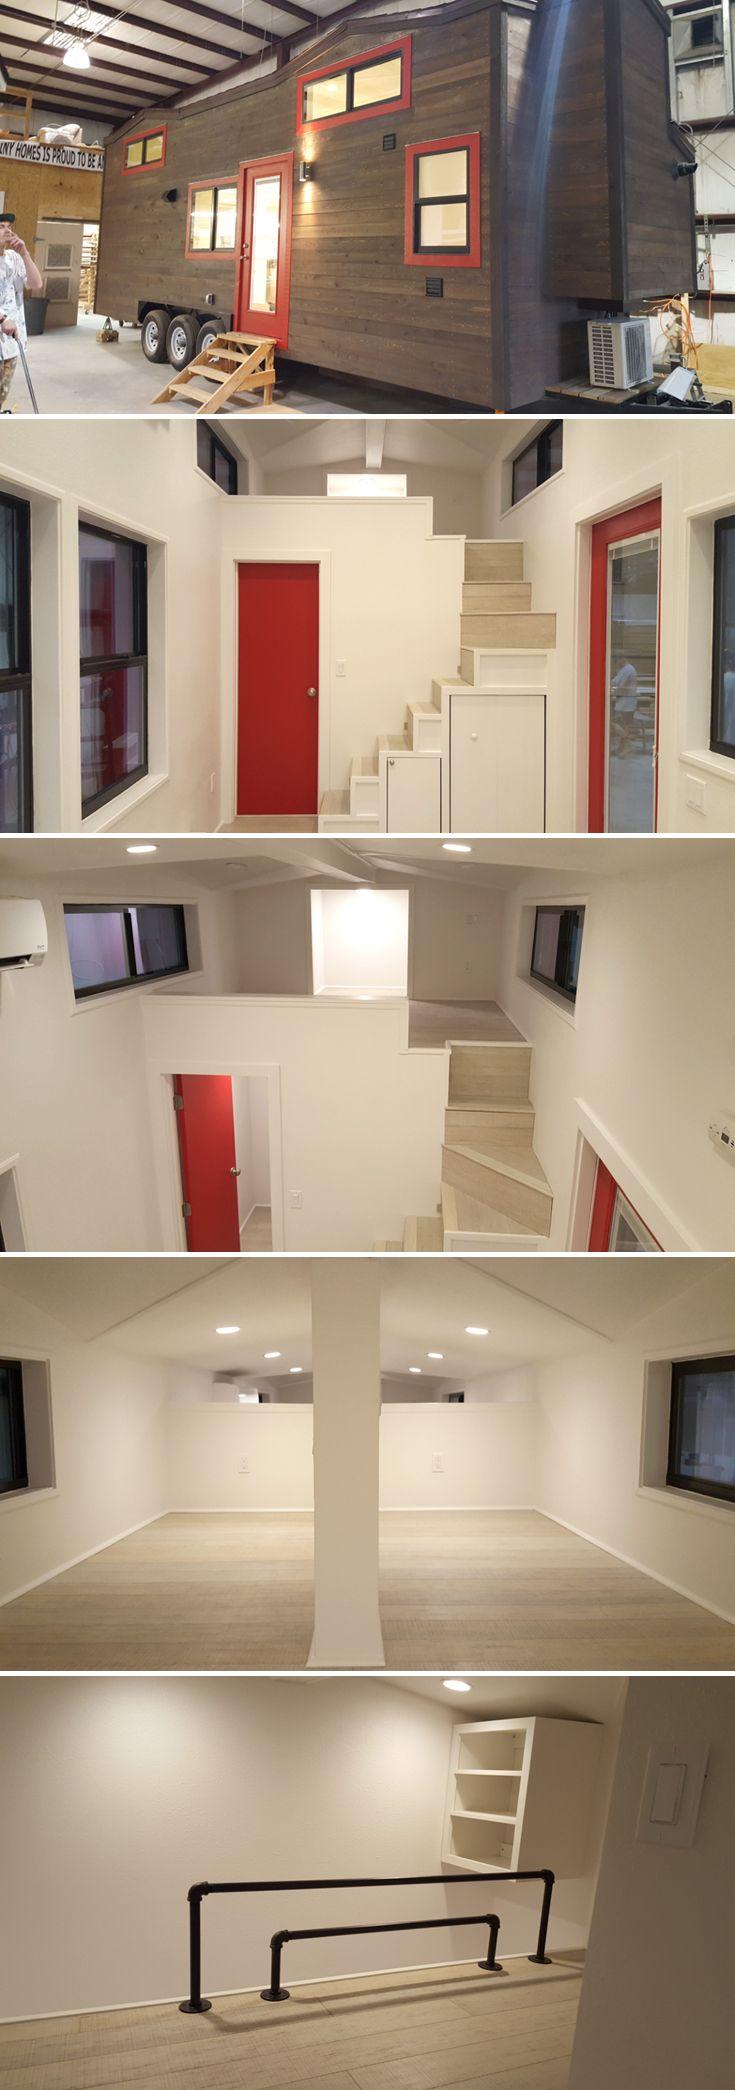 Loft Bedroom 17 Best Ideas About Bedroom Loft On Pinterest Mezzanine Bedroom